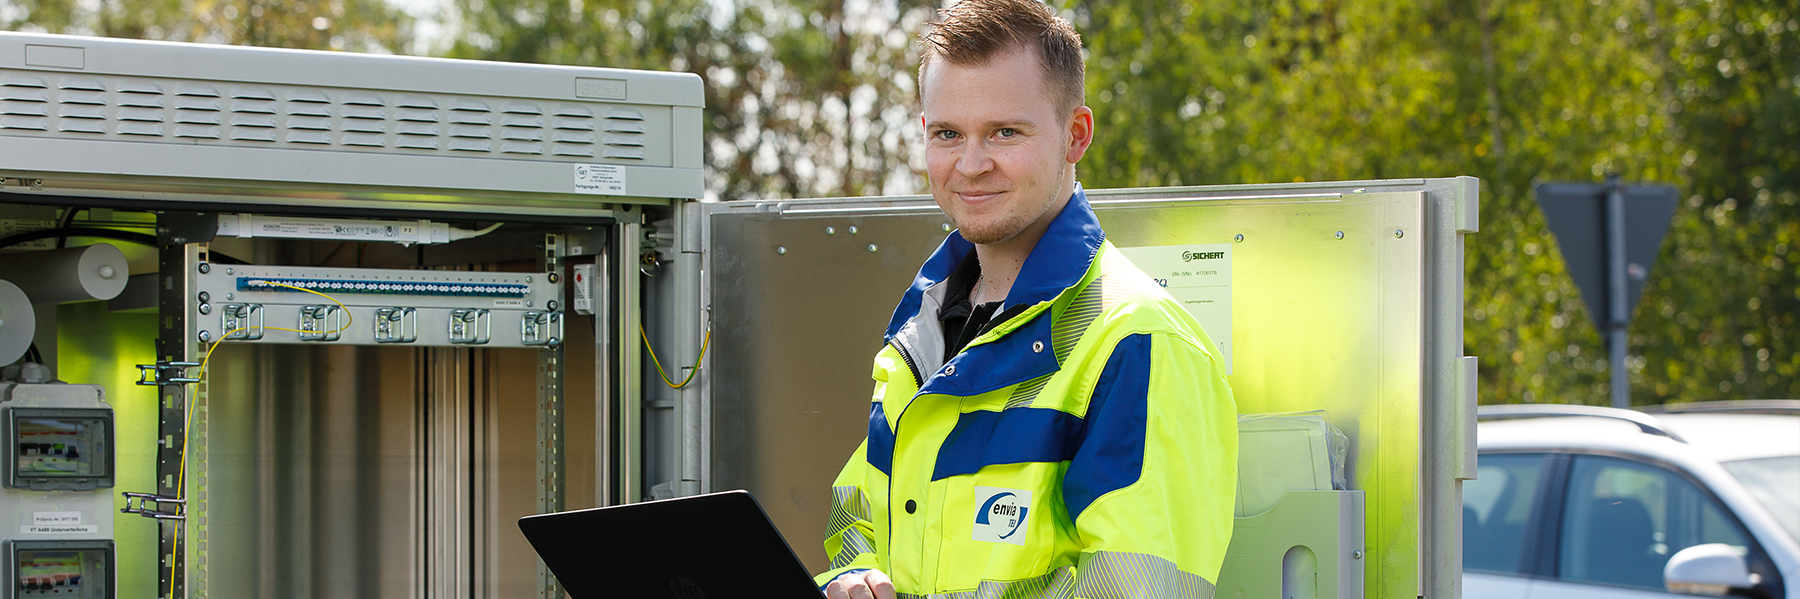 schnelles Internet in Limbach-Oberfrohna